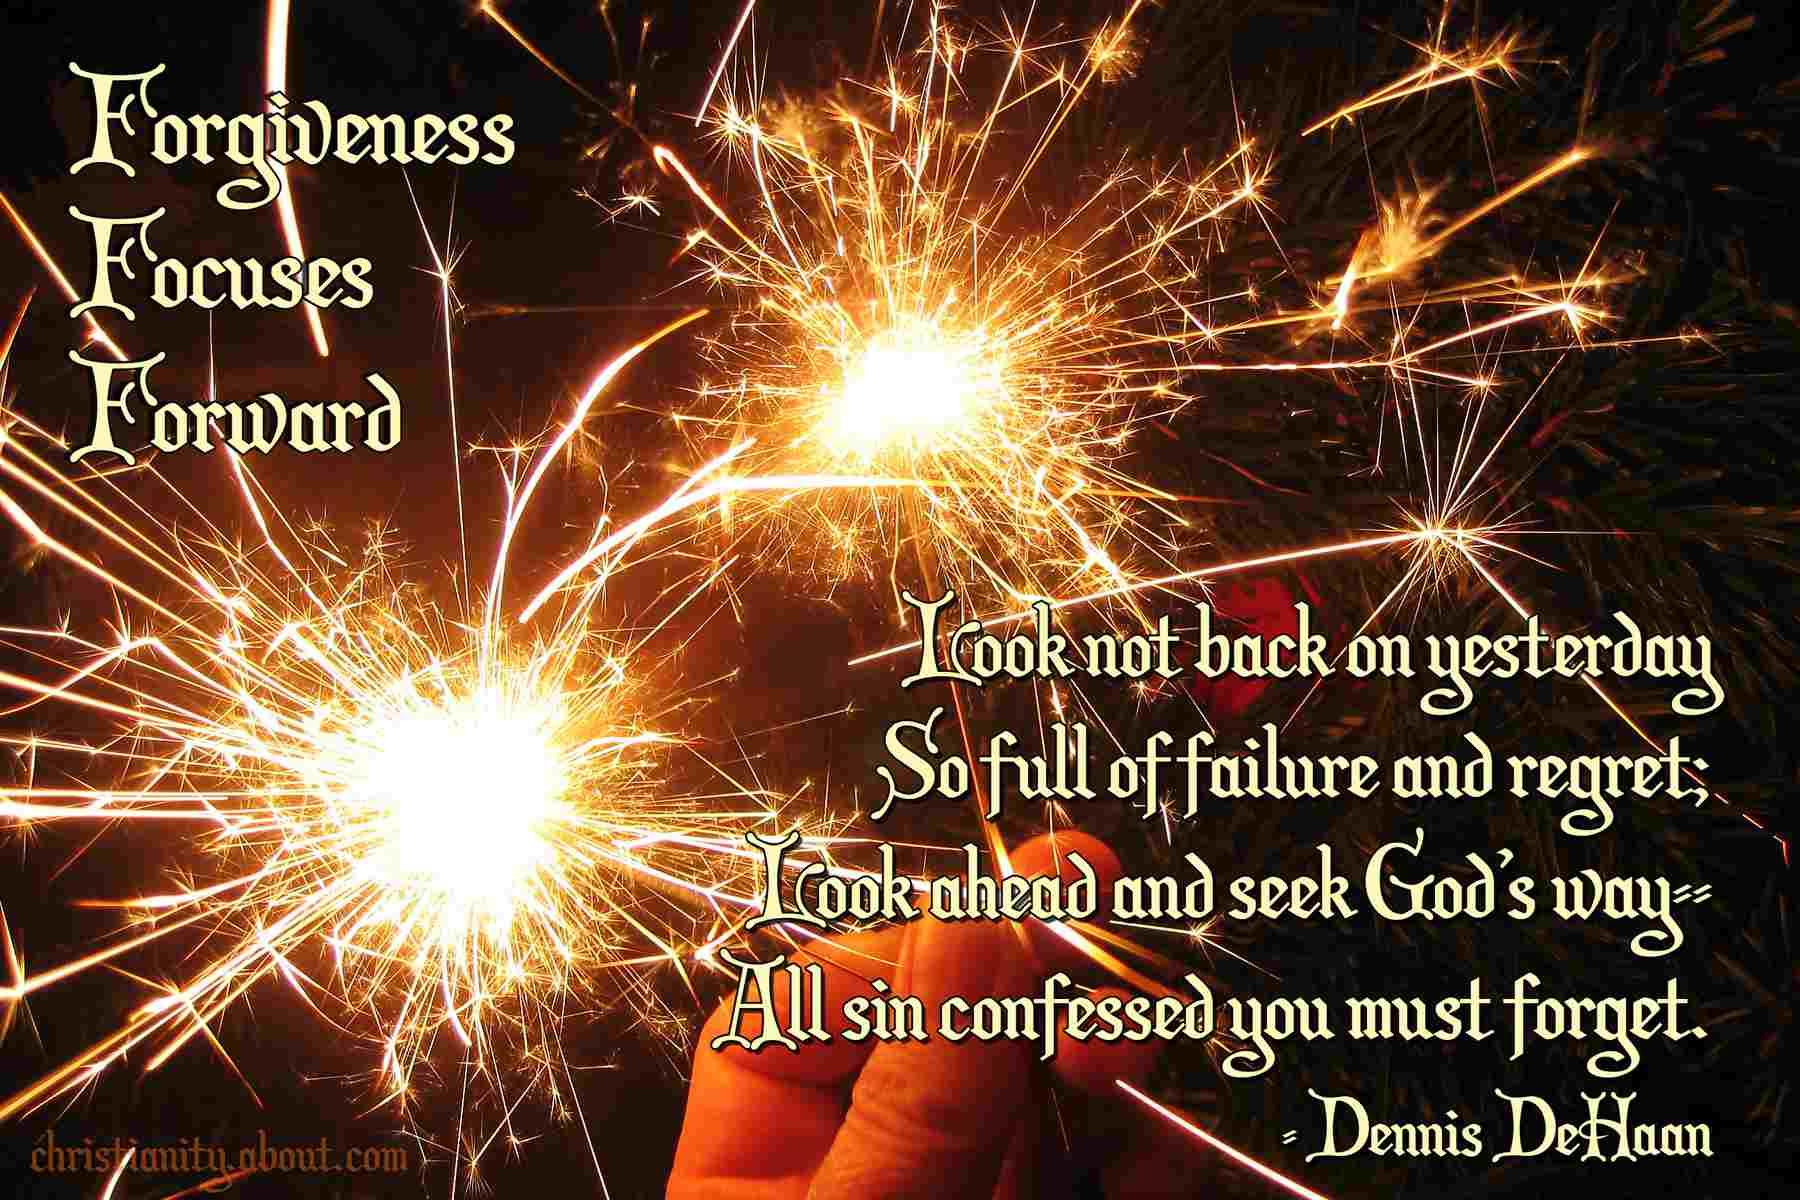 Forgiveness Focuses Forward